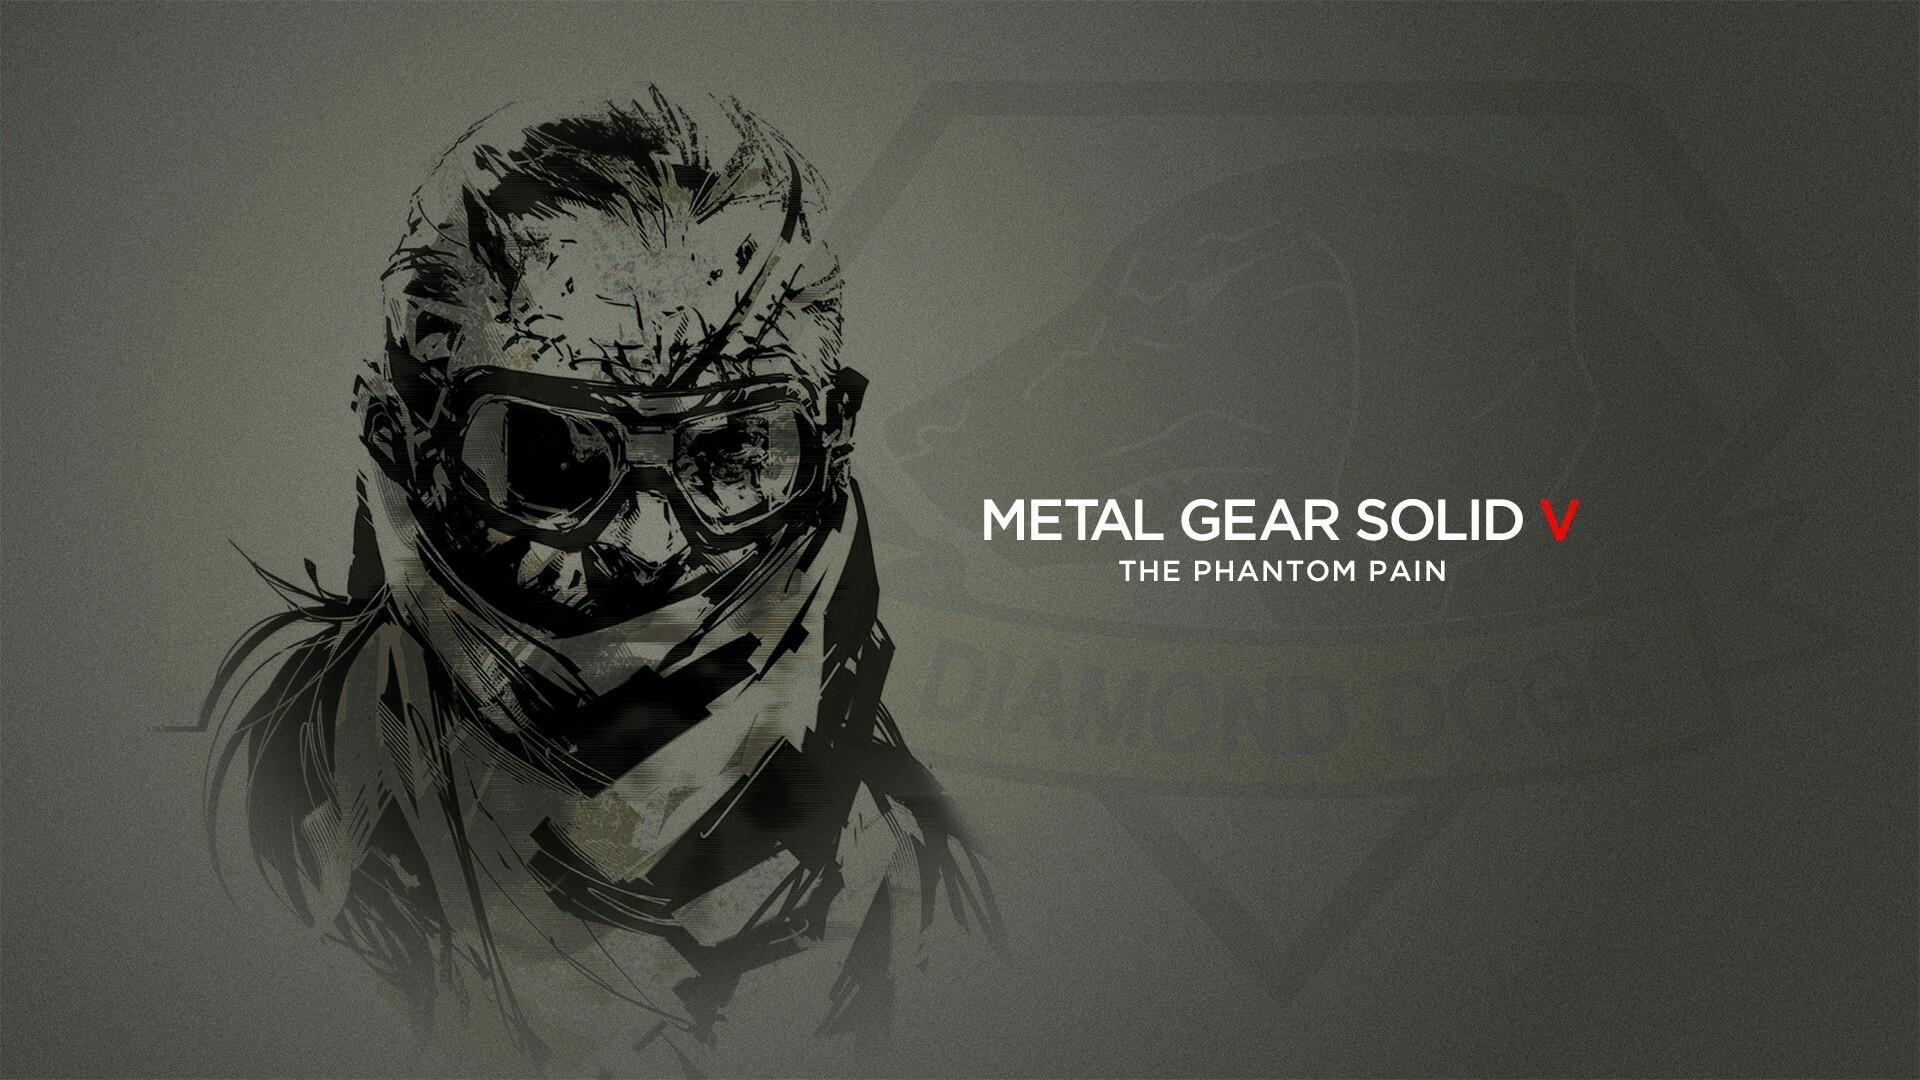 Metal Gear Solid V The Phantom Pain Wallpaper #mgsv #mgs #metalgearsolid  #metalgearsolidv